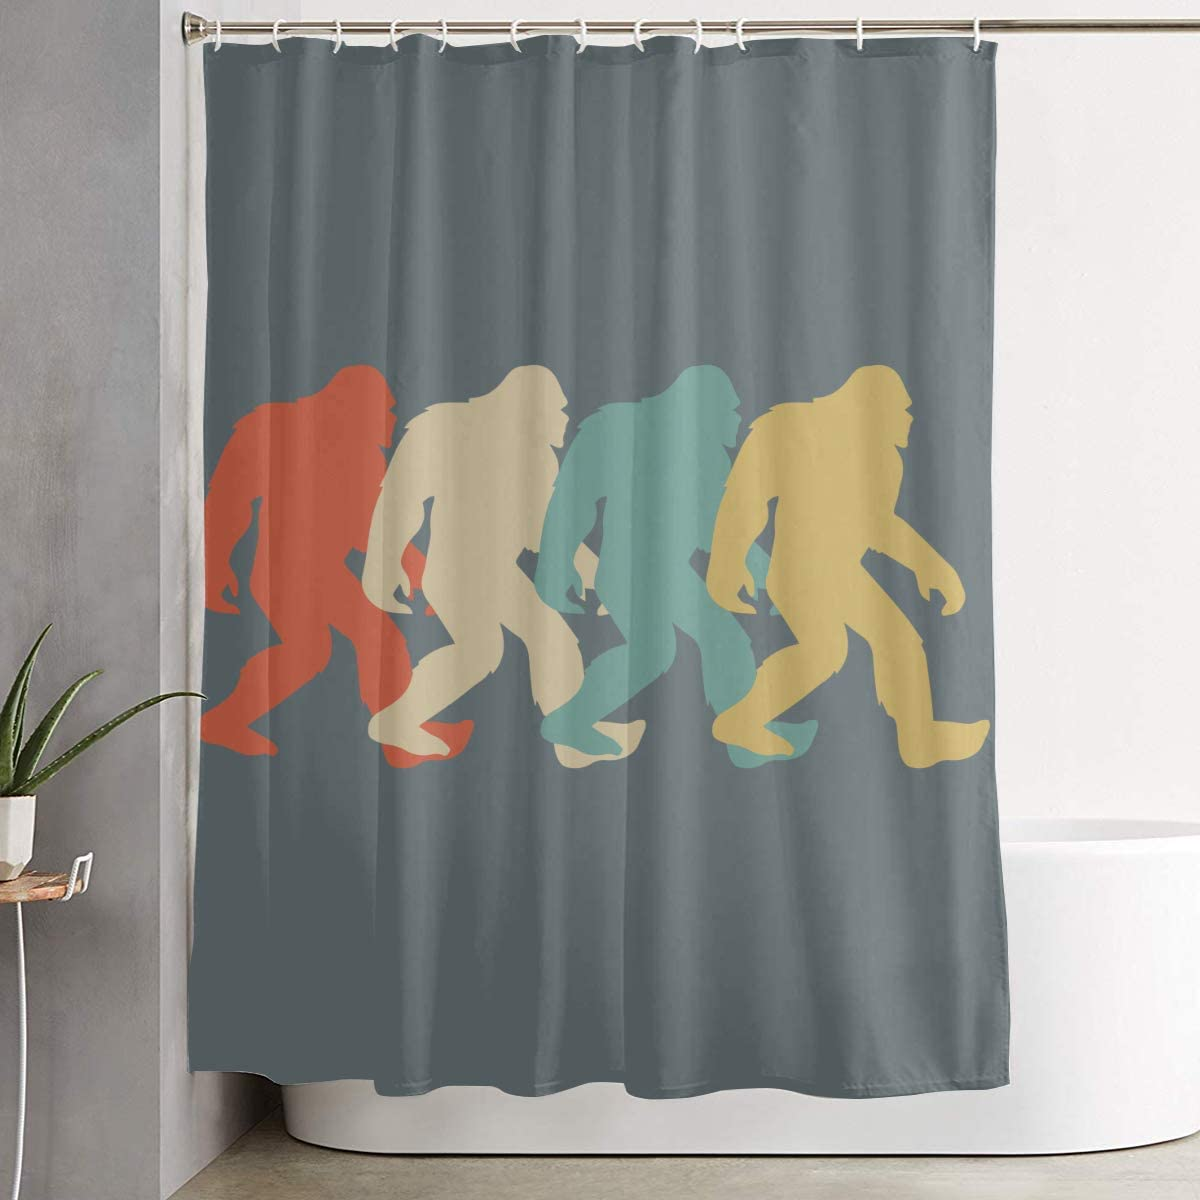 BHJ-YL Retro Bigfoot Sasquatch Elegant Polyester Shower Curtain Water-Repellent Shower Curtains Bathroom Sets for Home/Hotel Decor